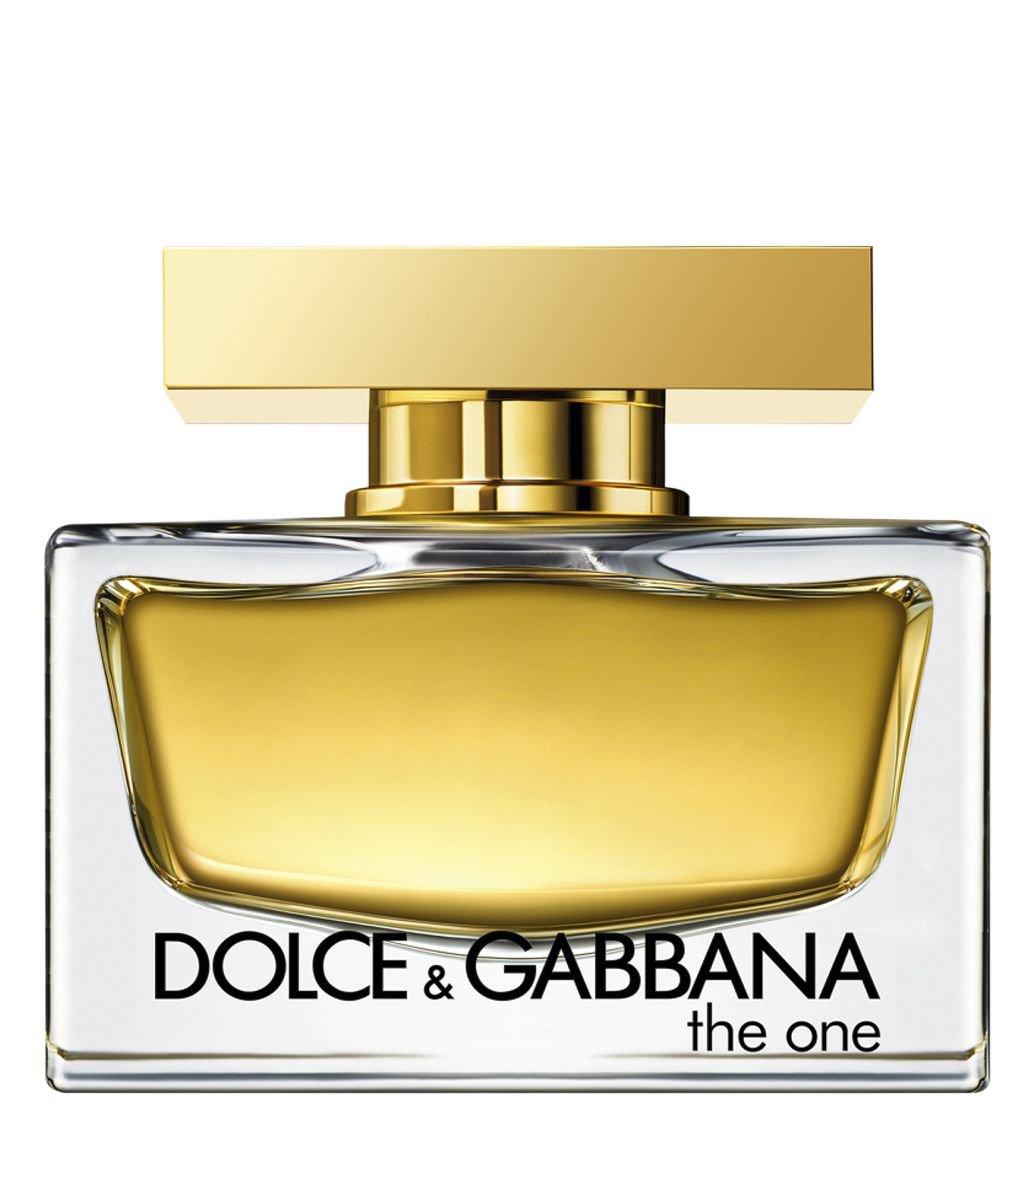 Perfume Dolce   Gabbana The One Feminino Eau de Parfum - Renner 7628ba87f2